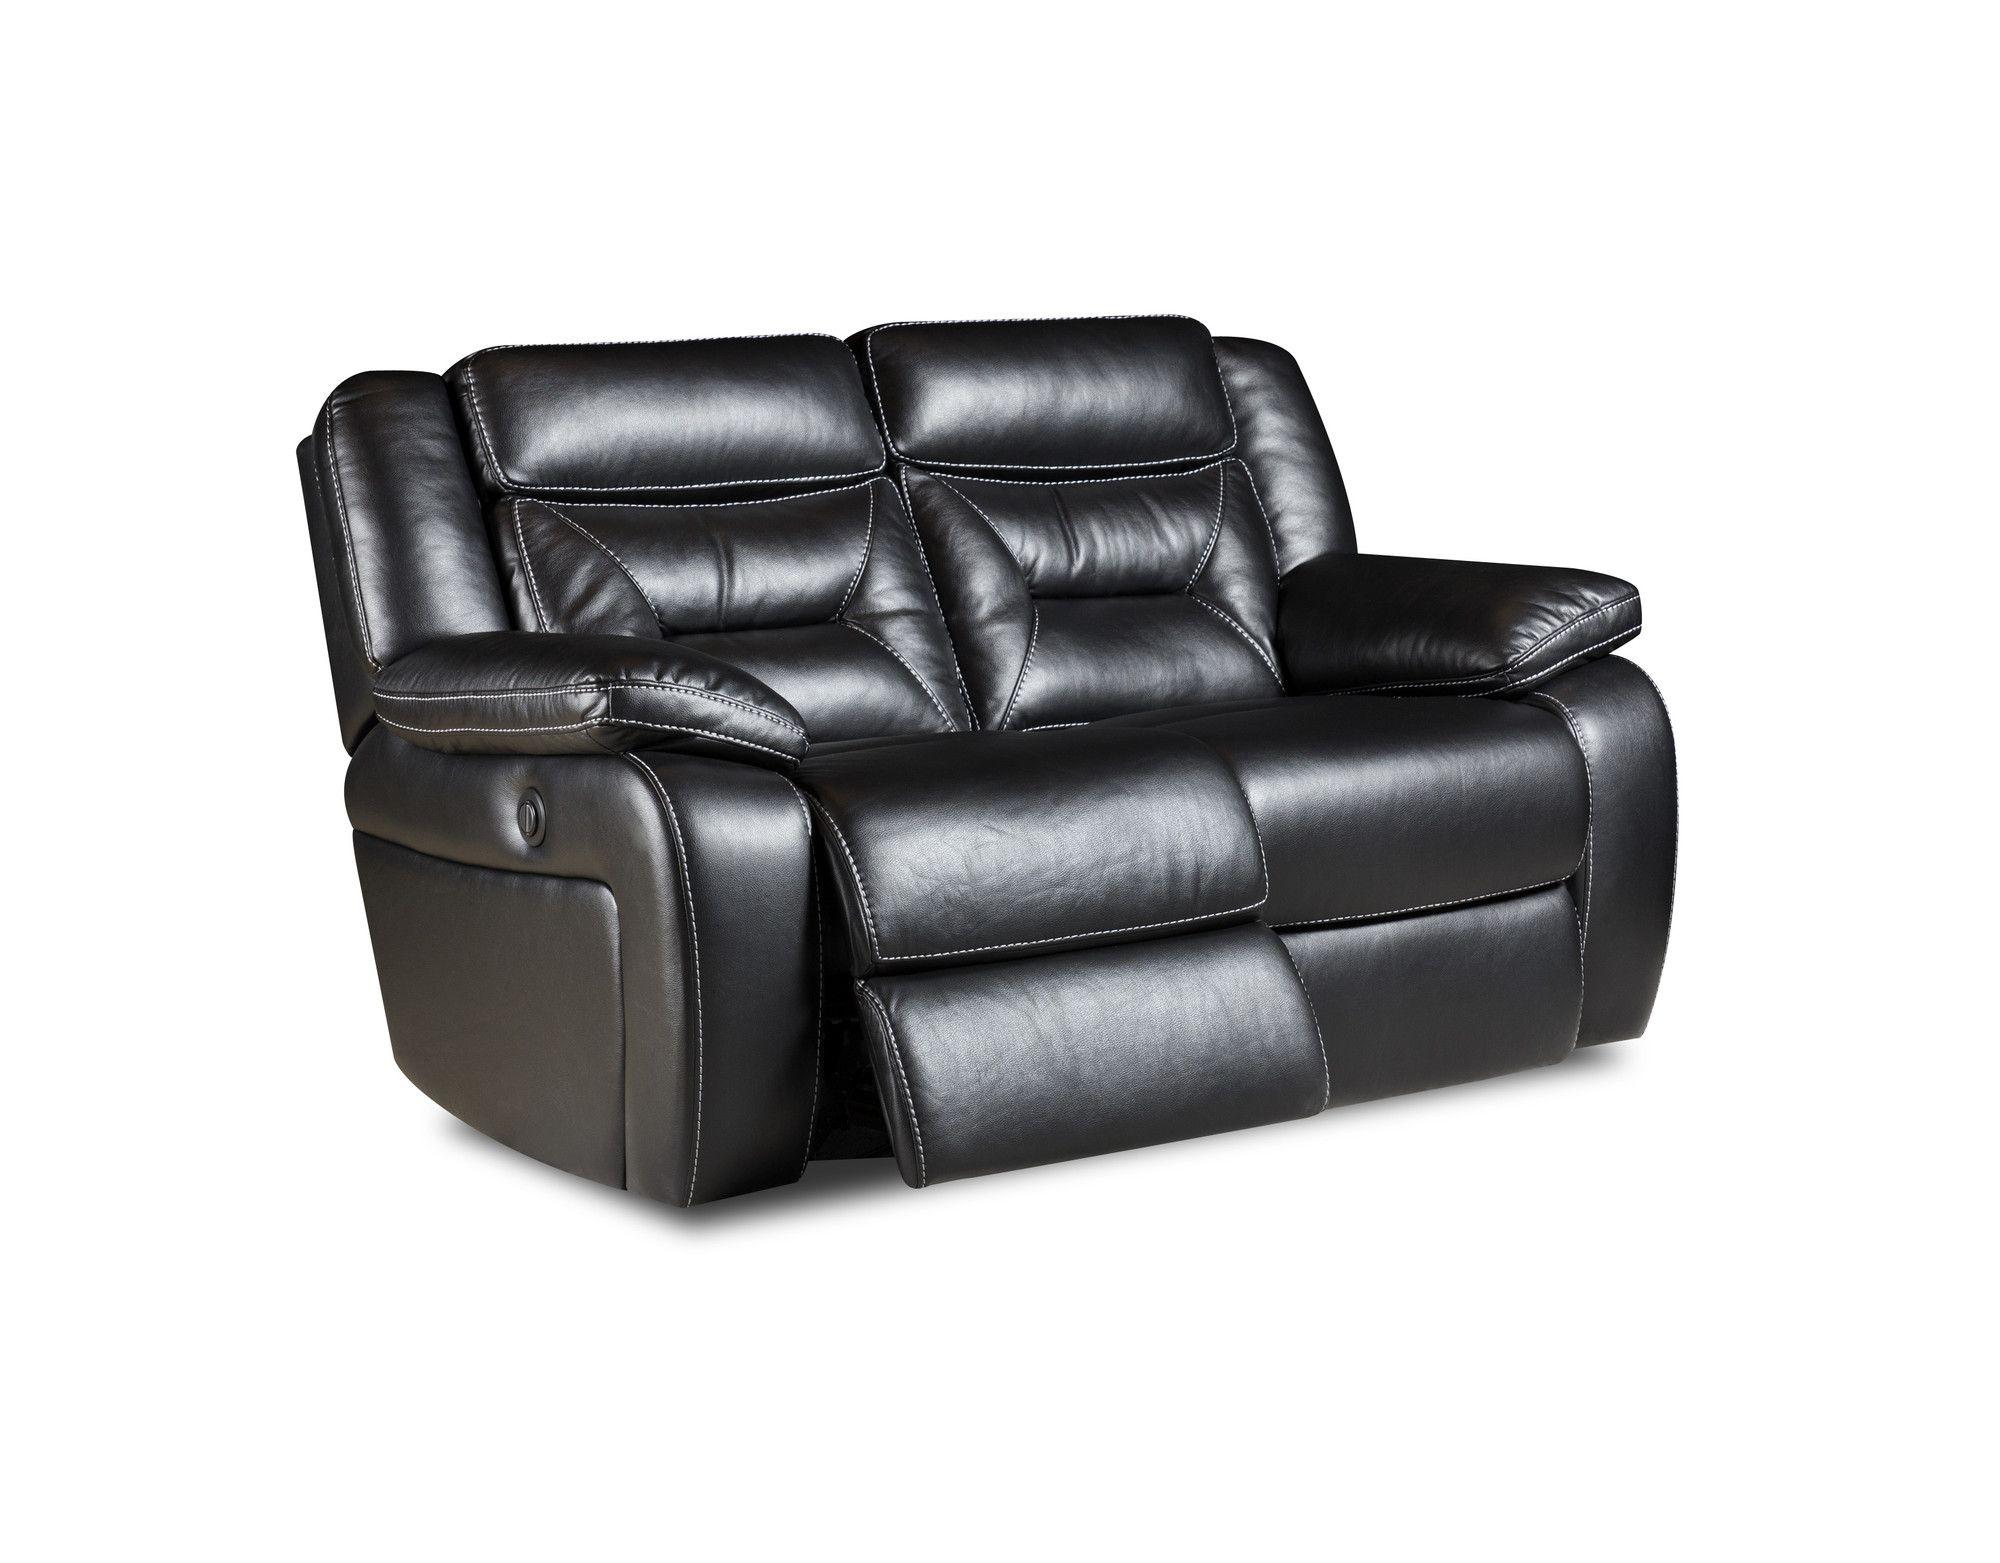 Lee Furniture Jamestown Double Reclining Loveseat U0026 Reviews | Wayfair